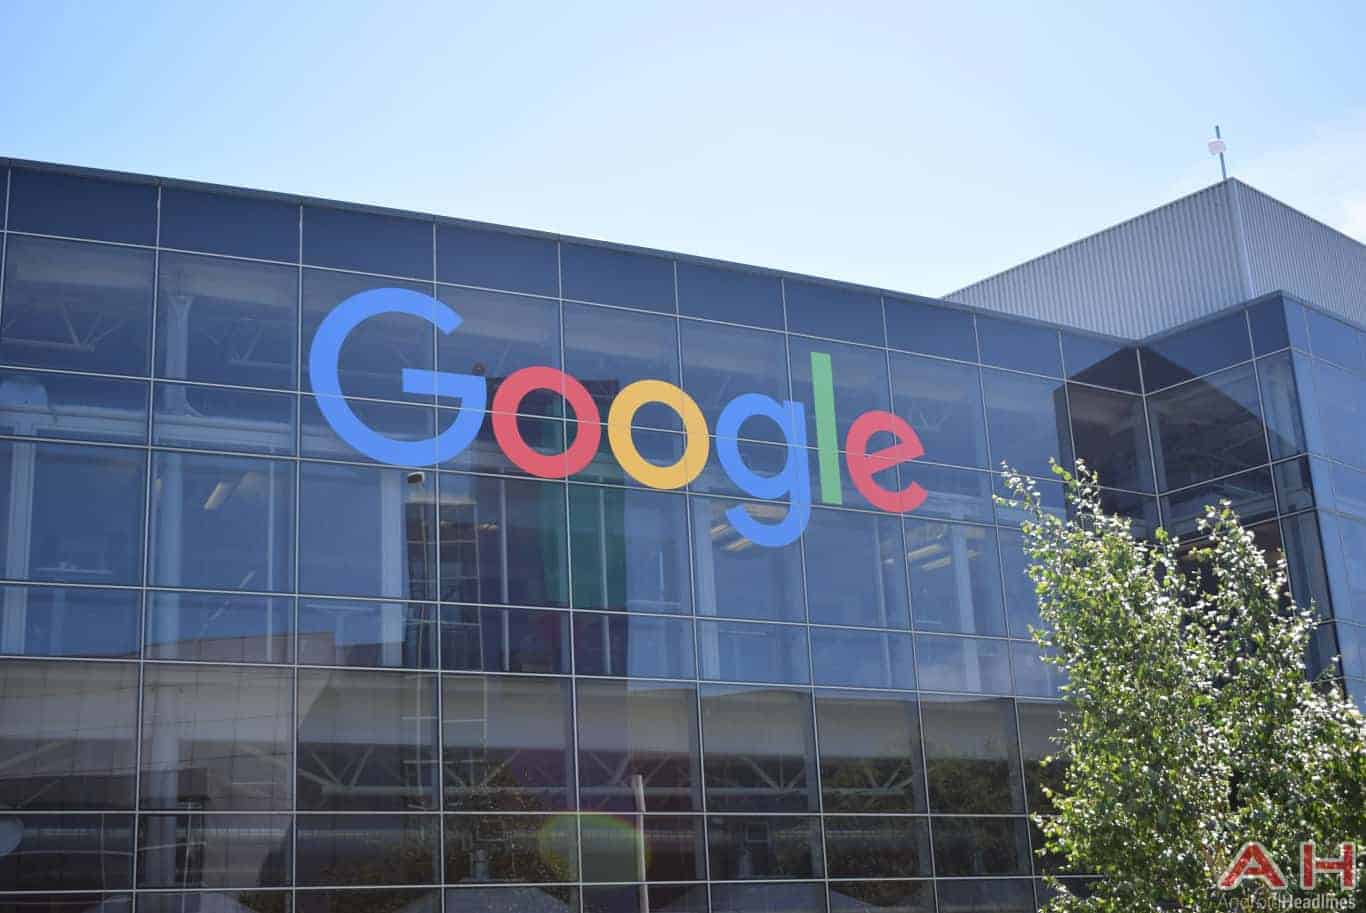 Googleplex Google Logo AH 7